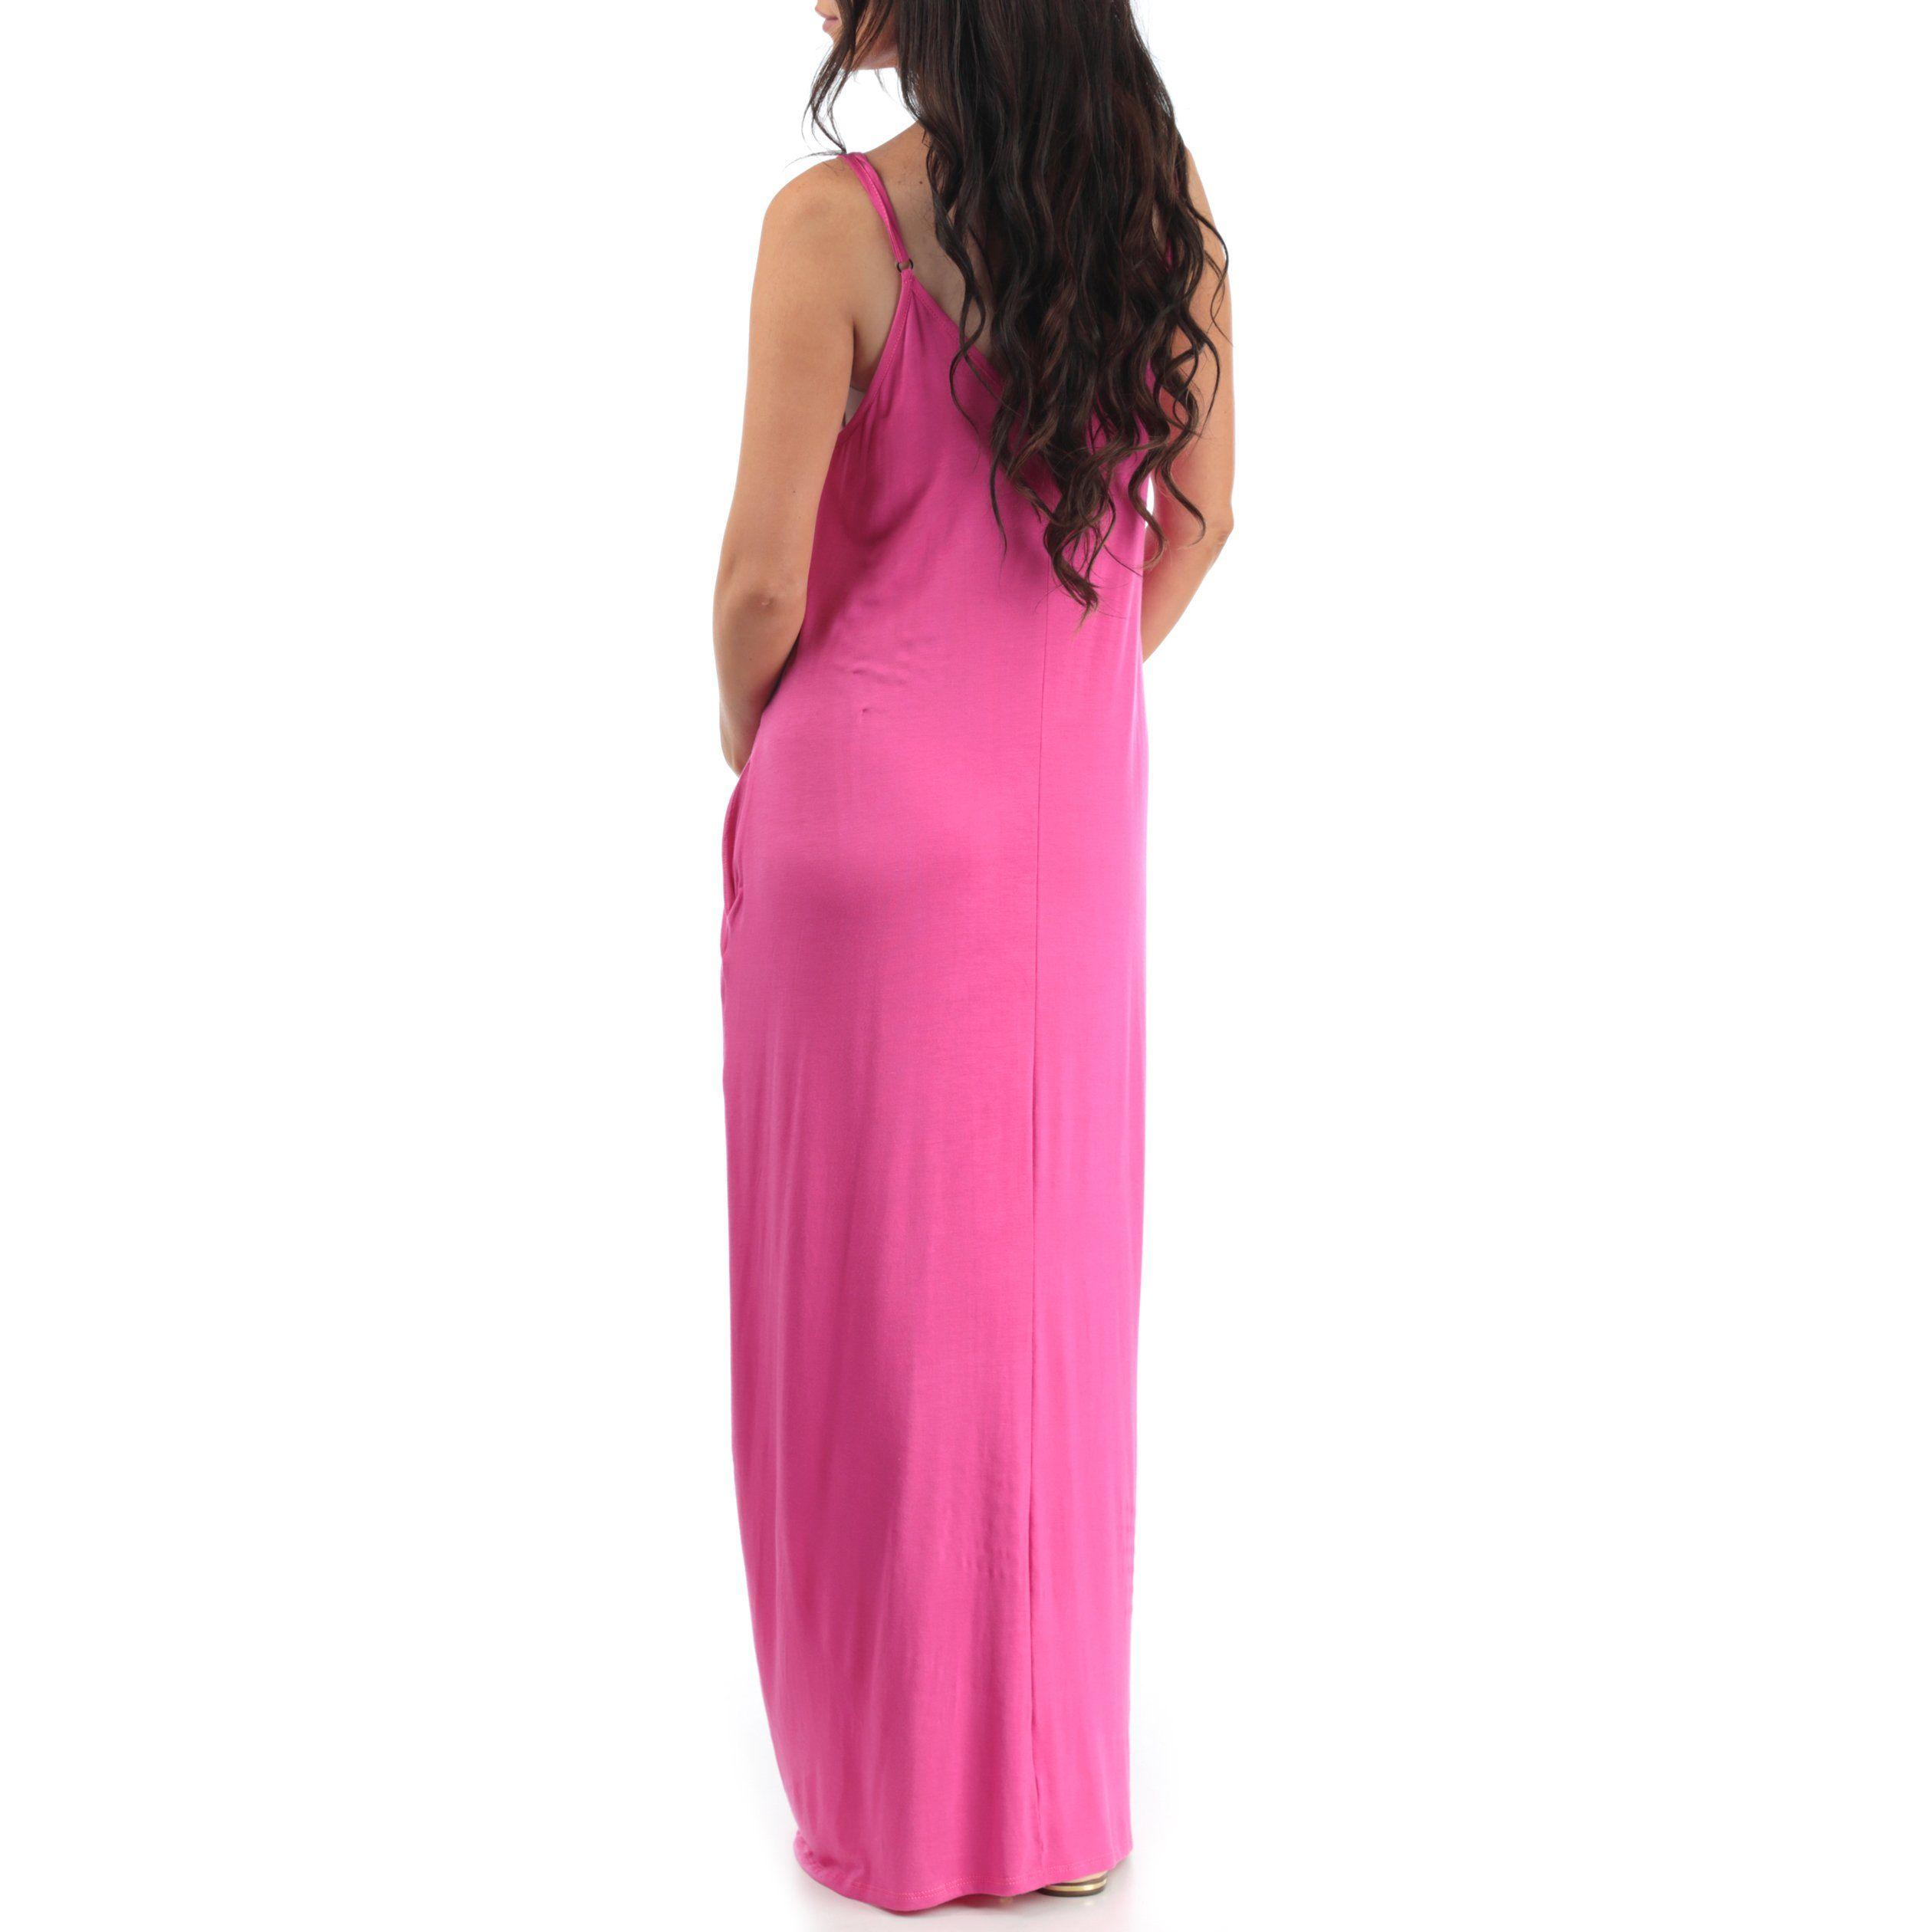 Pin On Maternity Fashion Dressy [ 2520 x 2520 Pixel ]